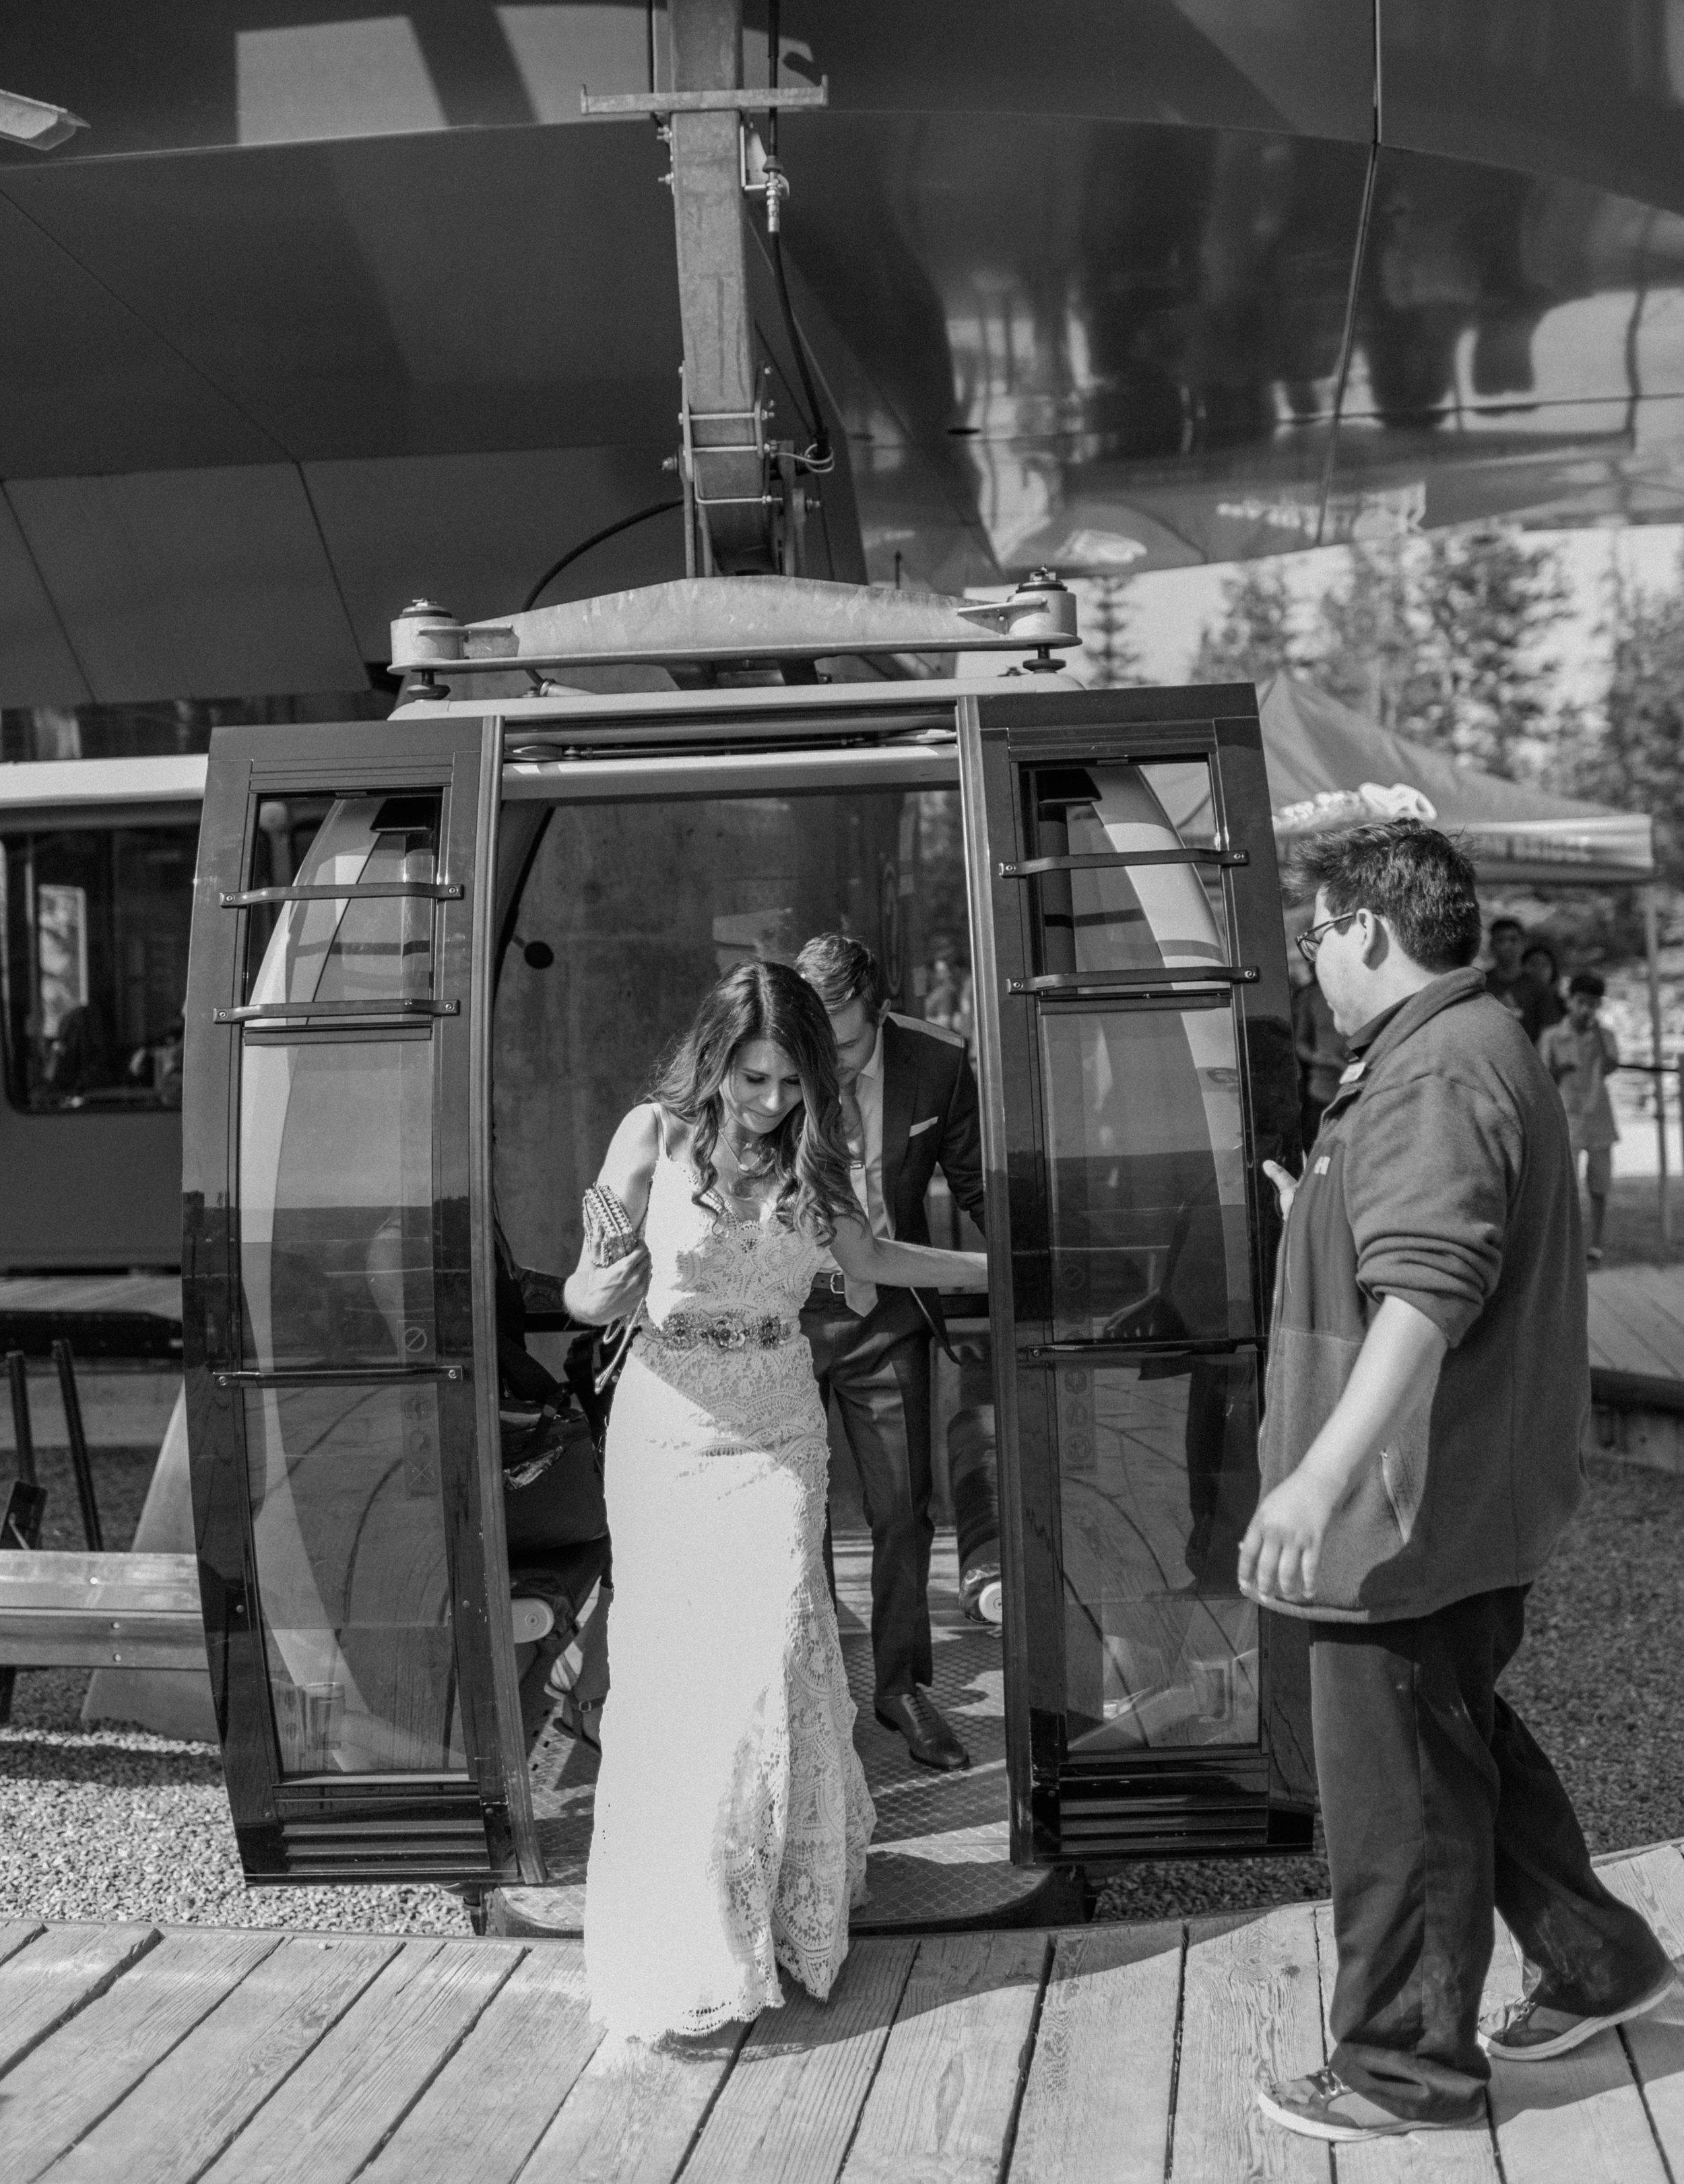 austin-texas-wedding-photography-1778-photographie-39.jpg